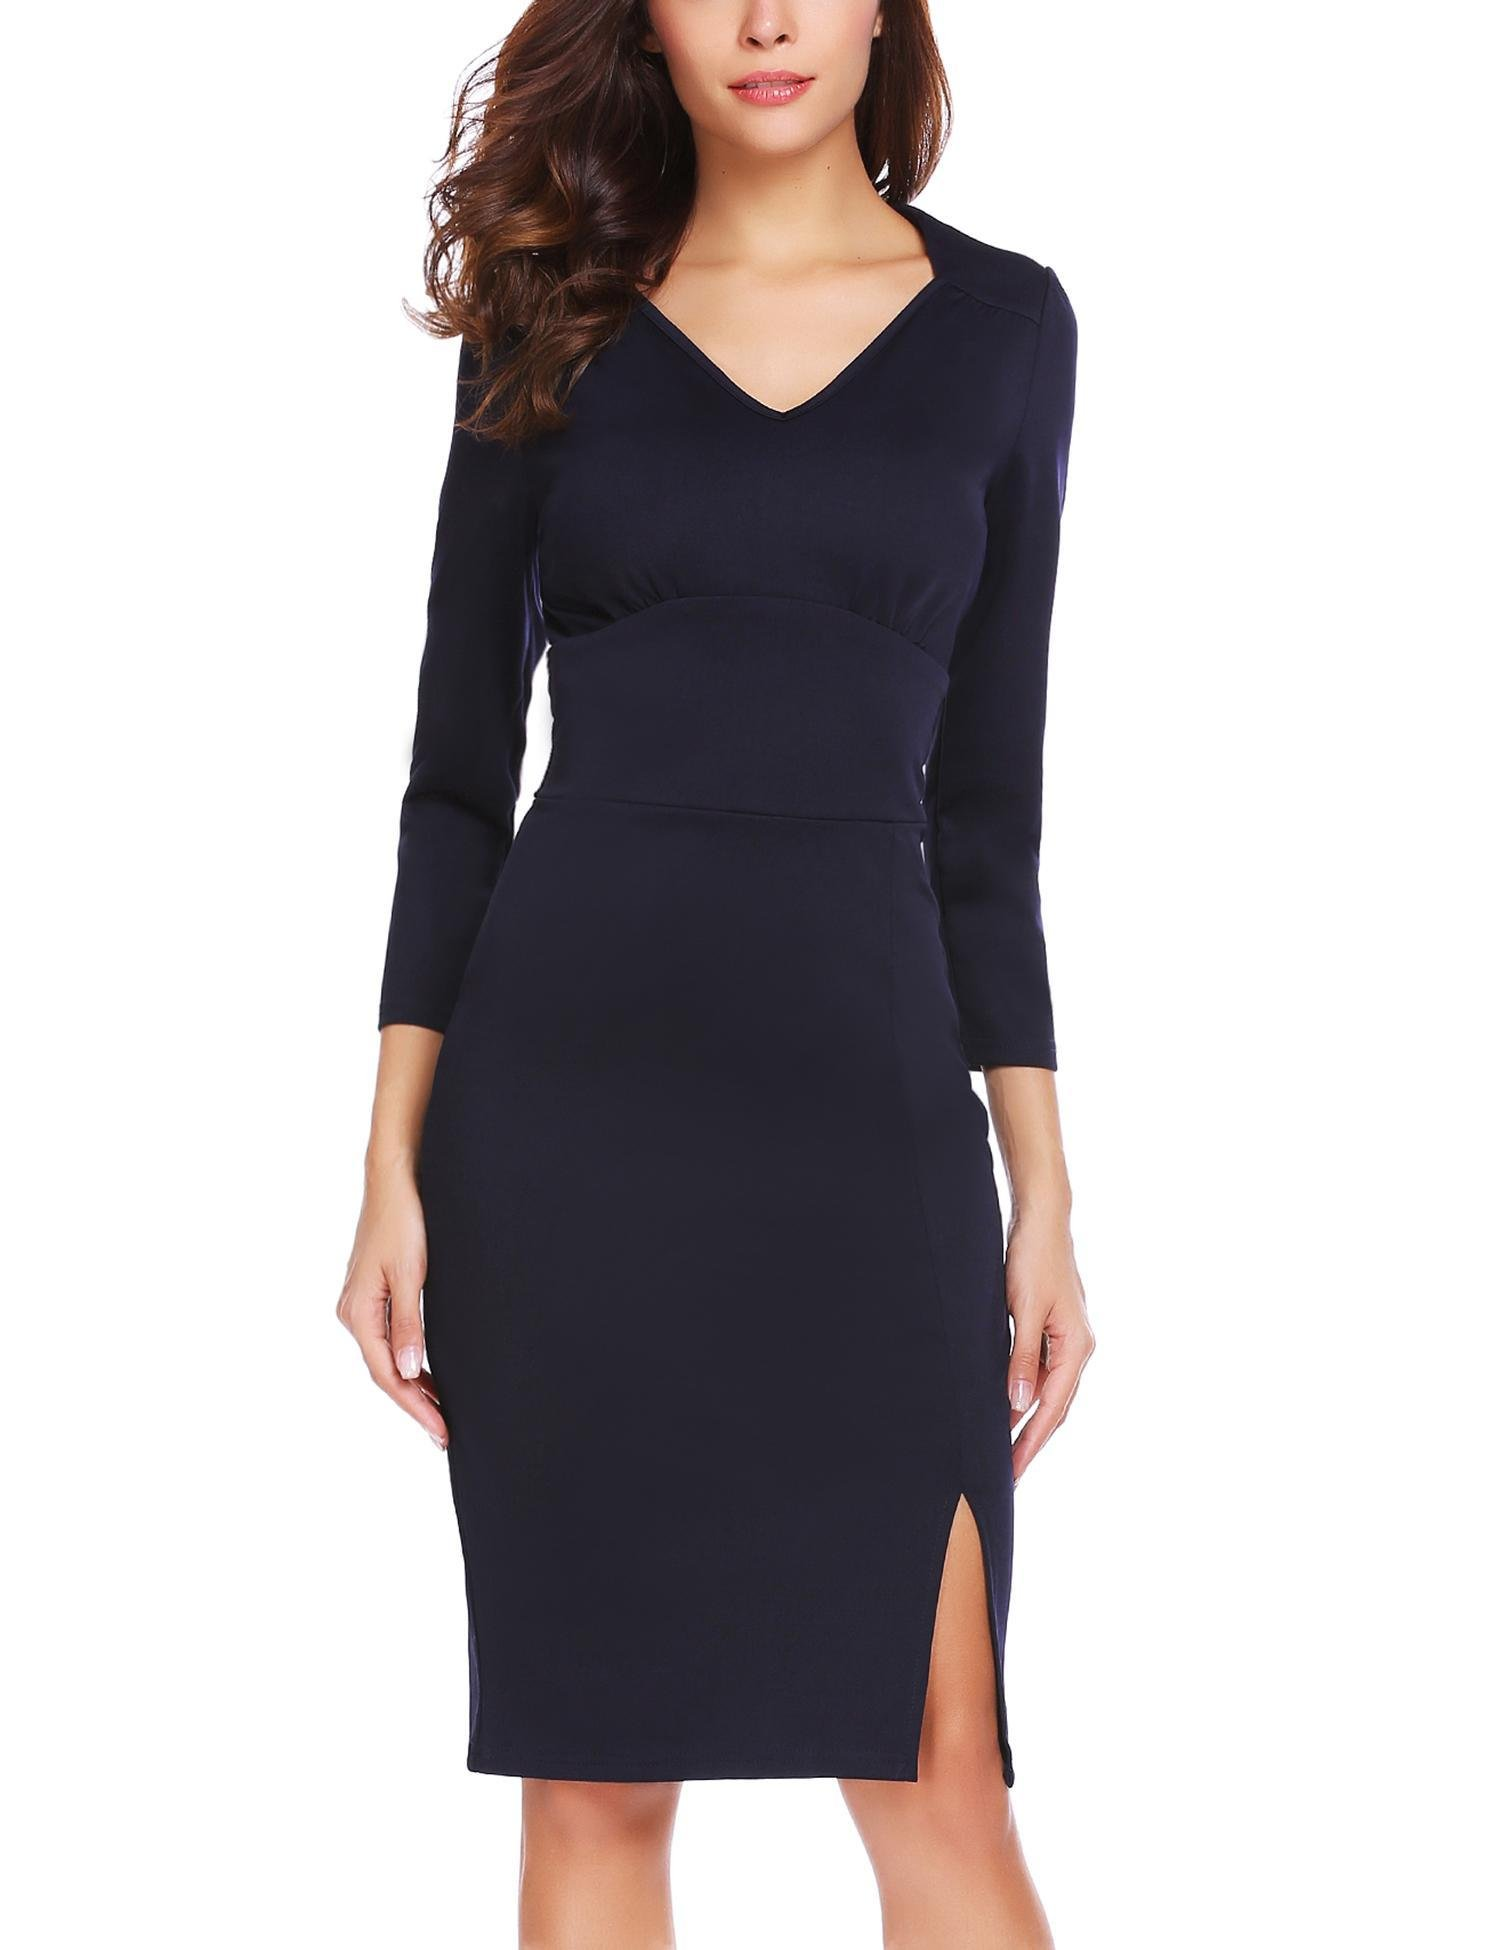 ANGVNS Women's V-Neck 3/4 Sleeve High Waist Wear to Work Pencil Split Midi Dress